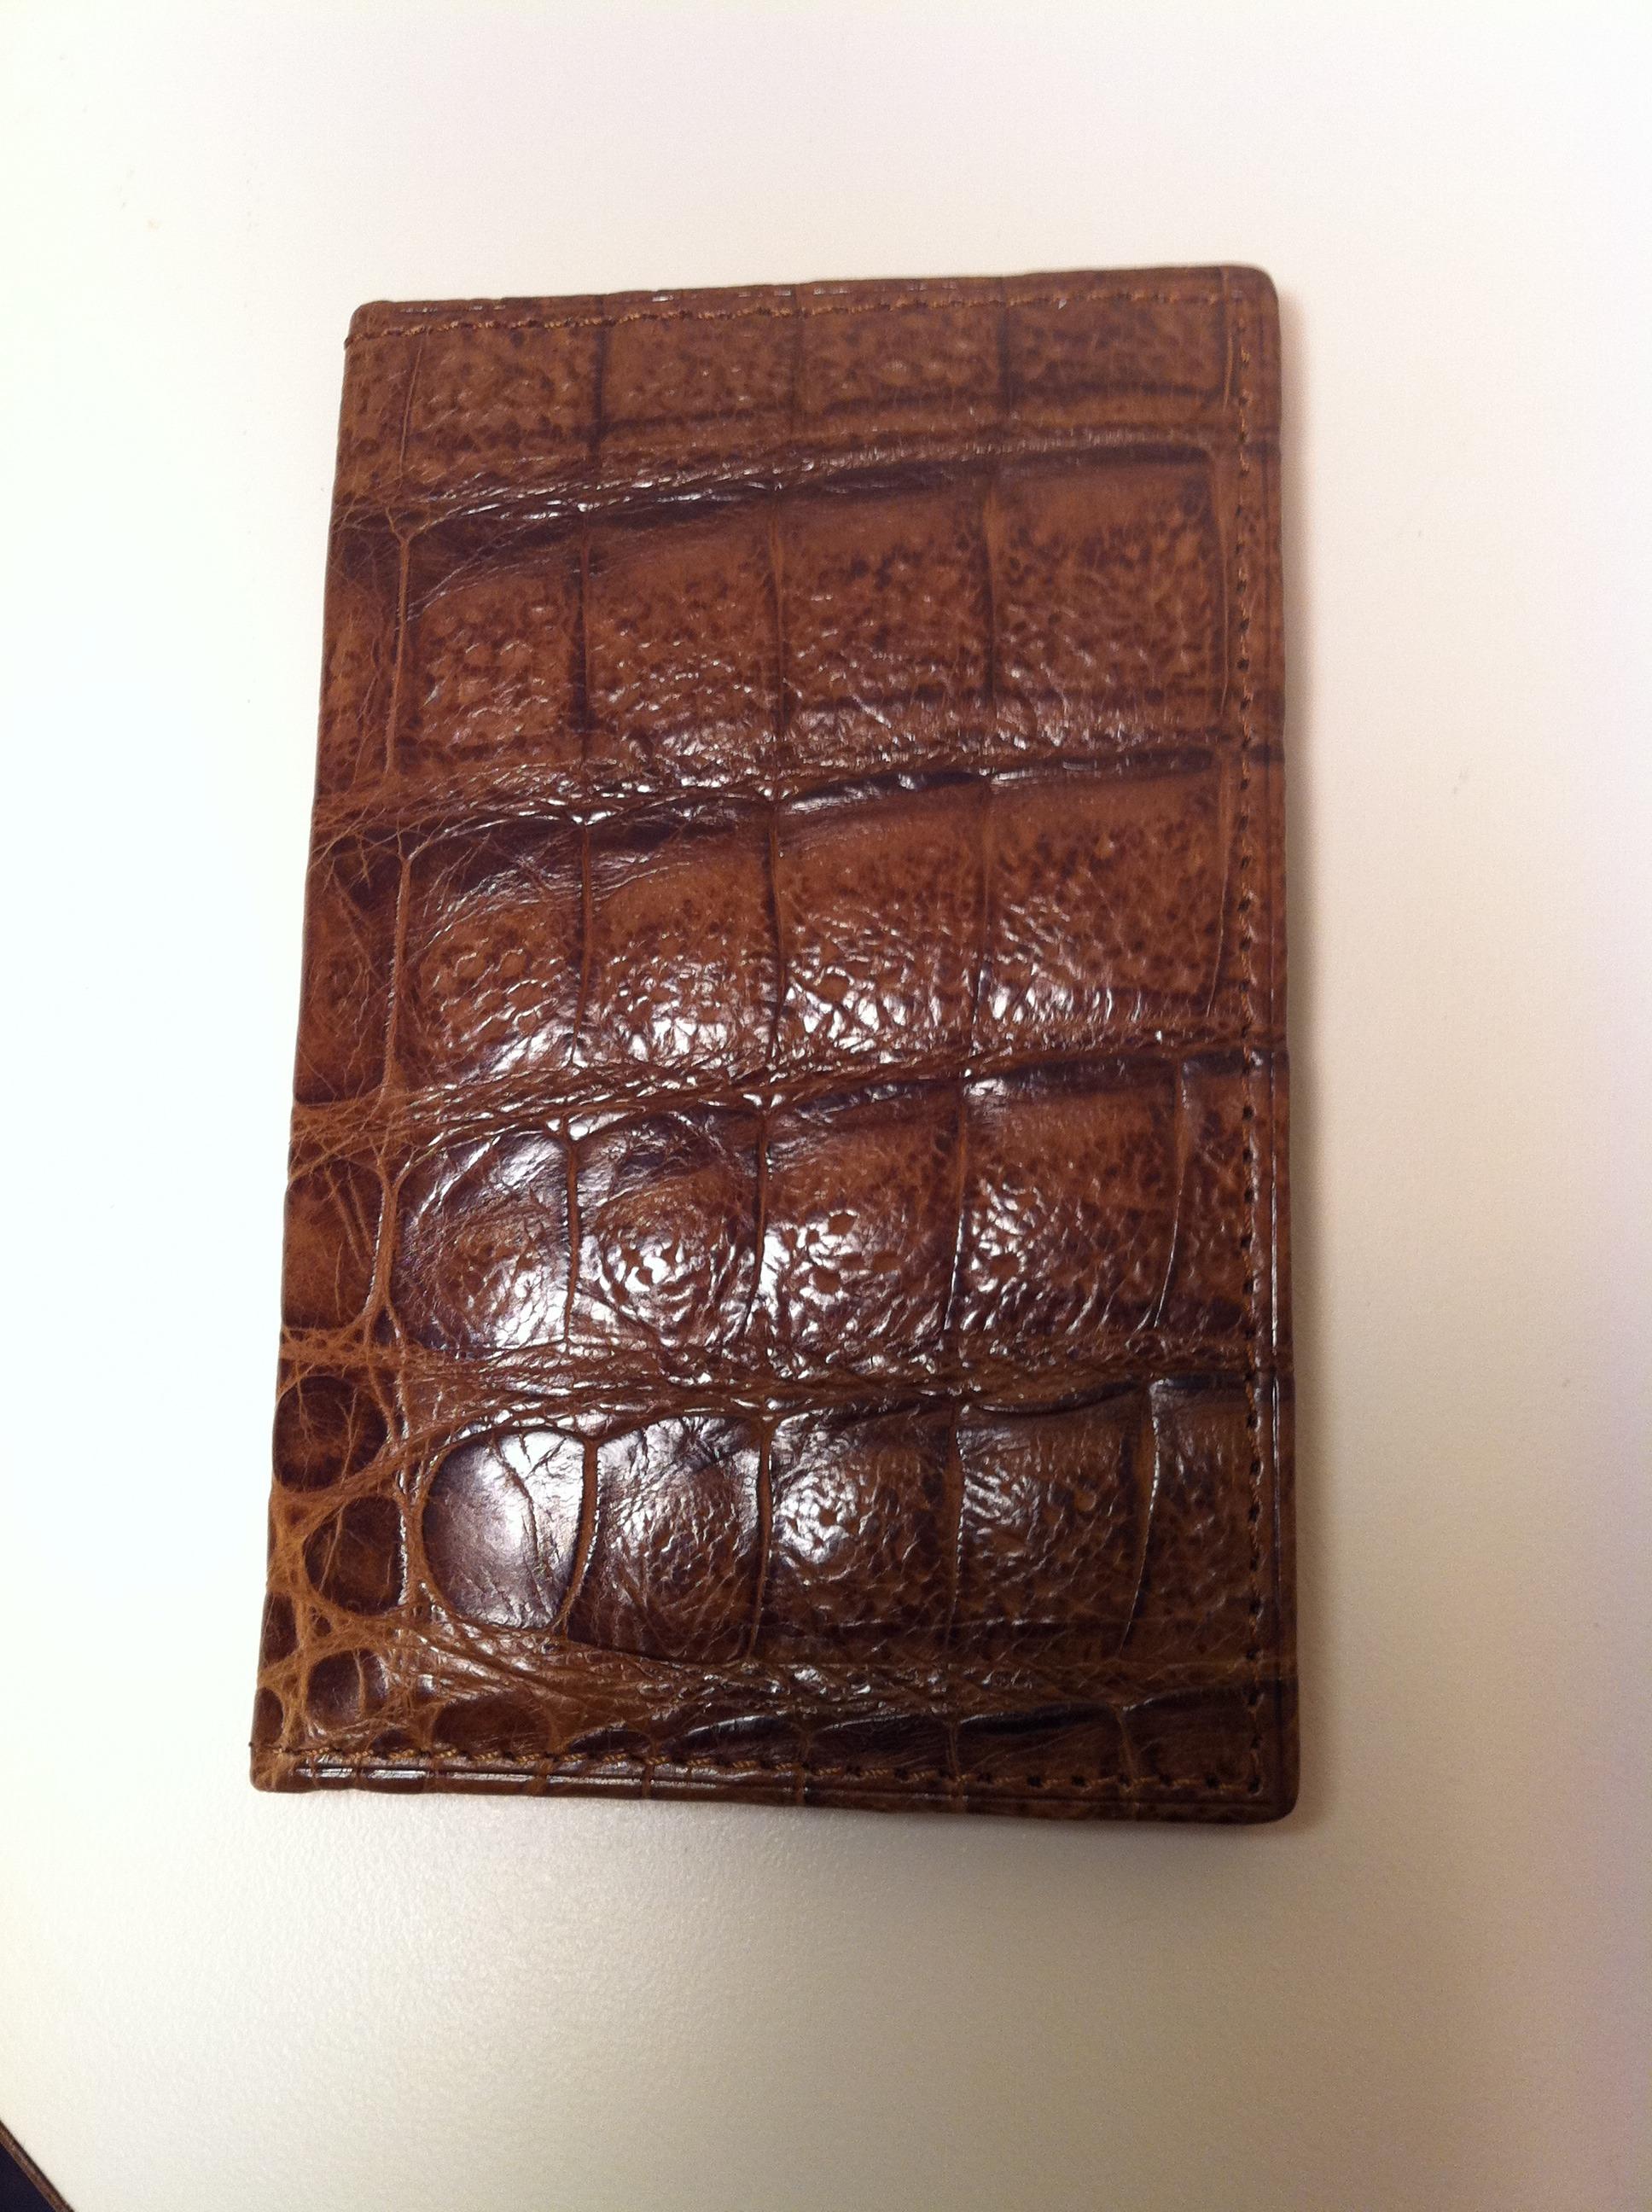 Stefan Mann Caiman Crocodile Cardcase